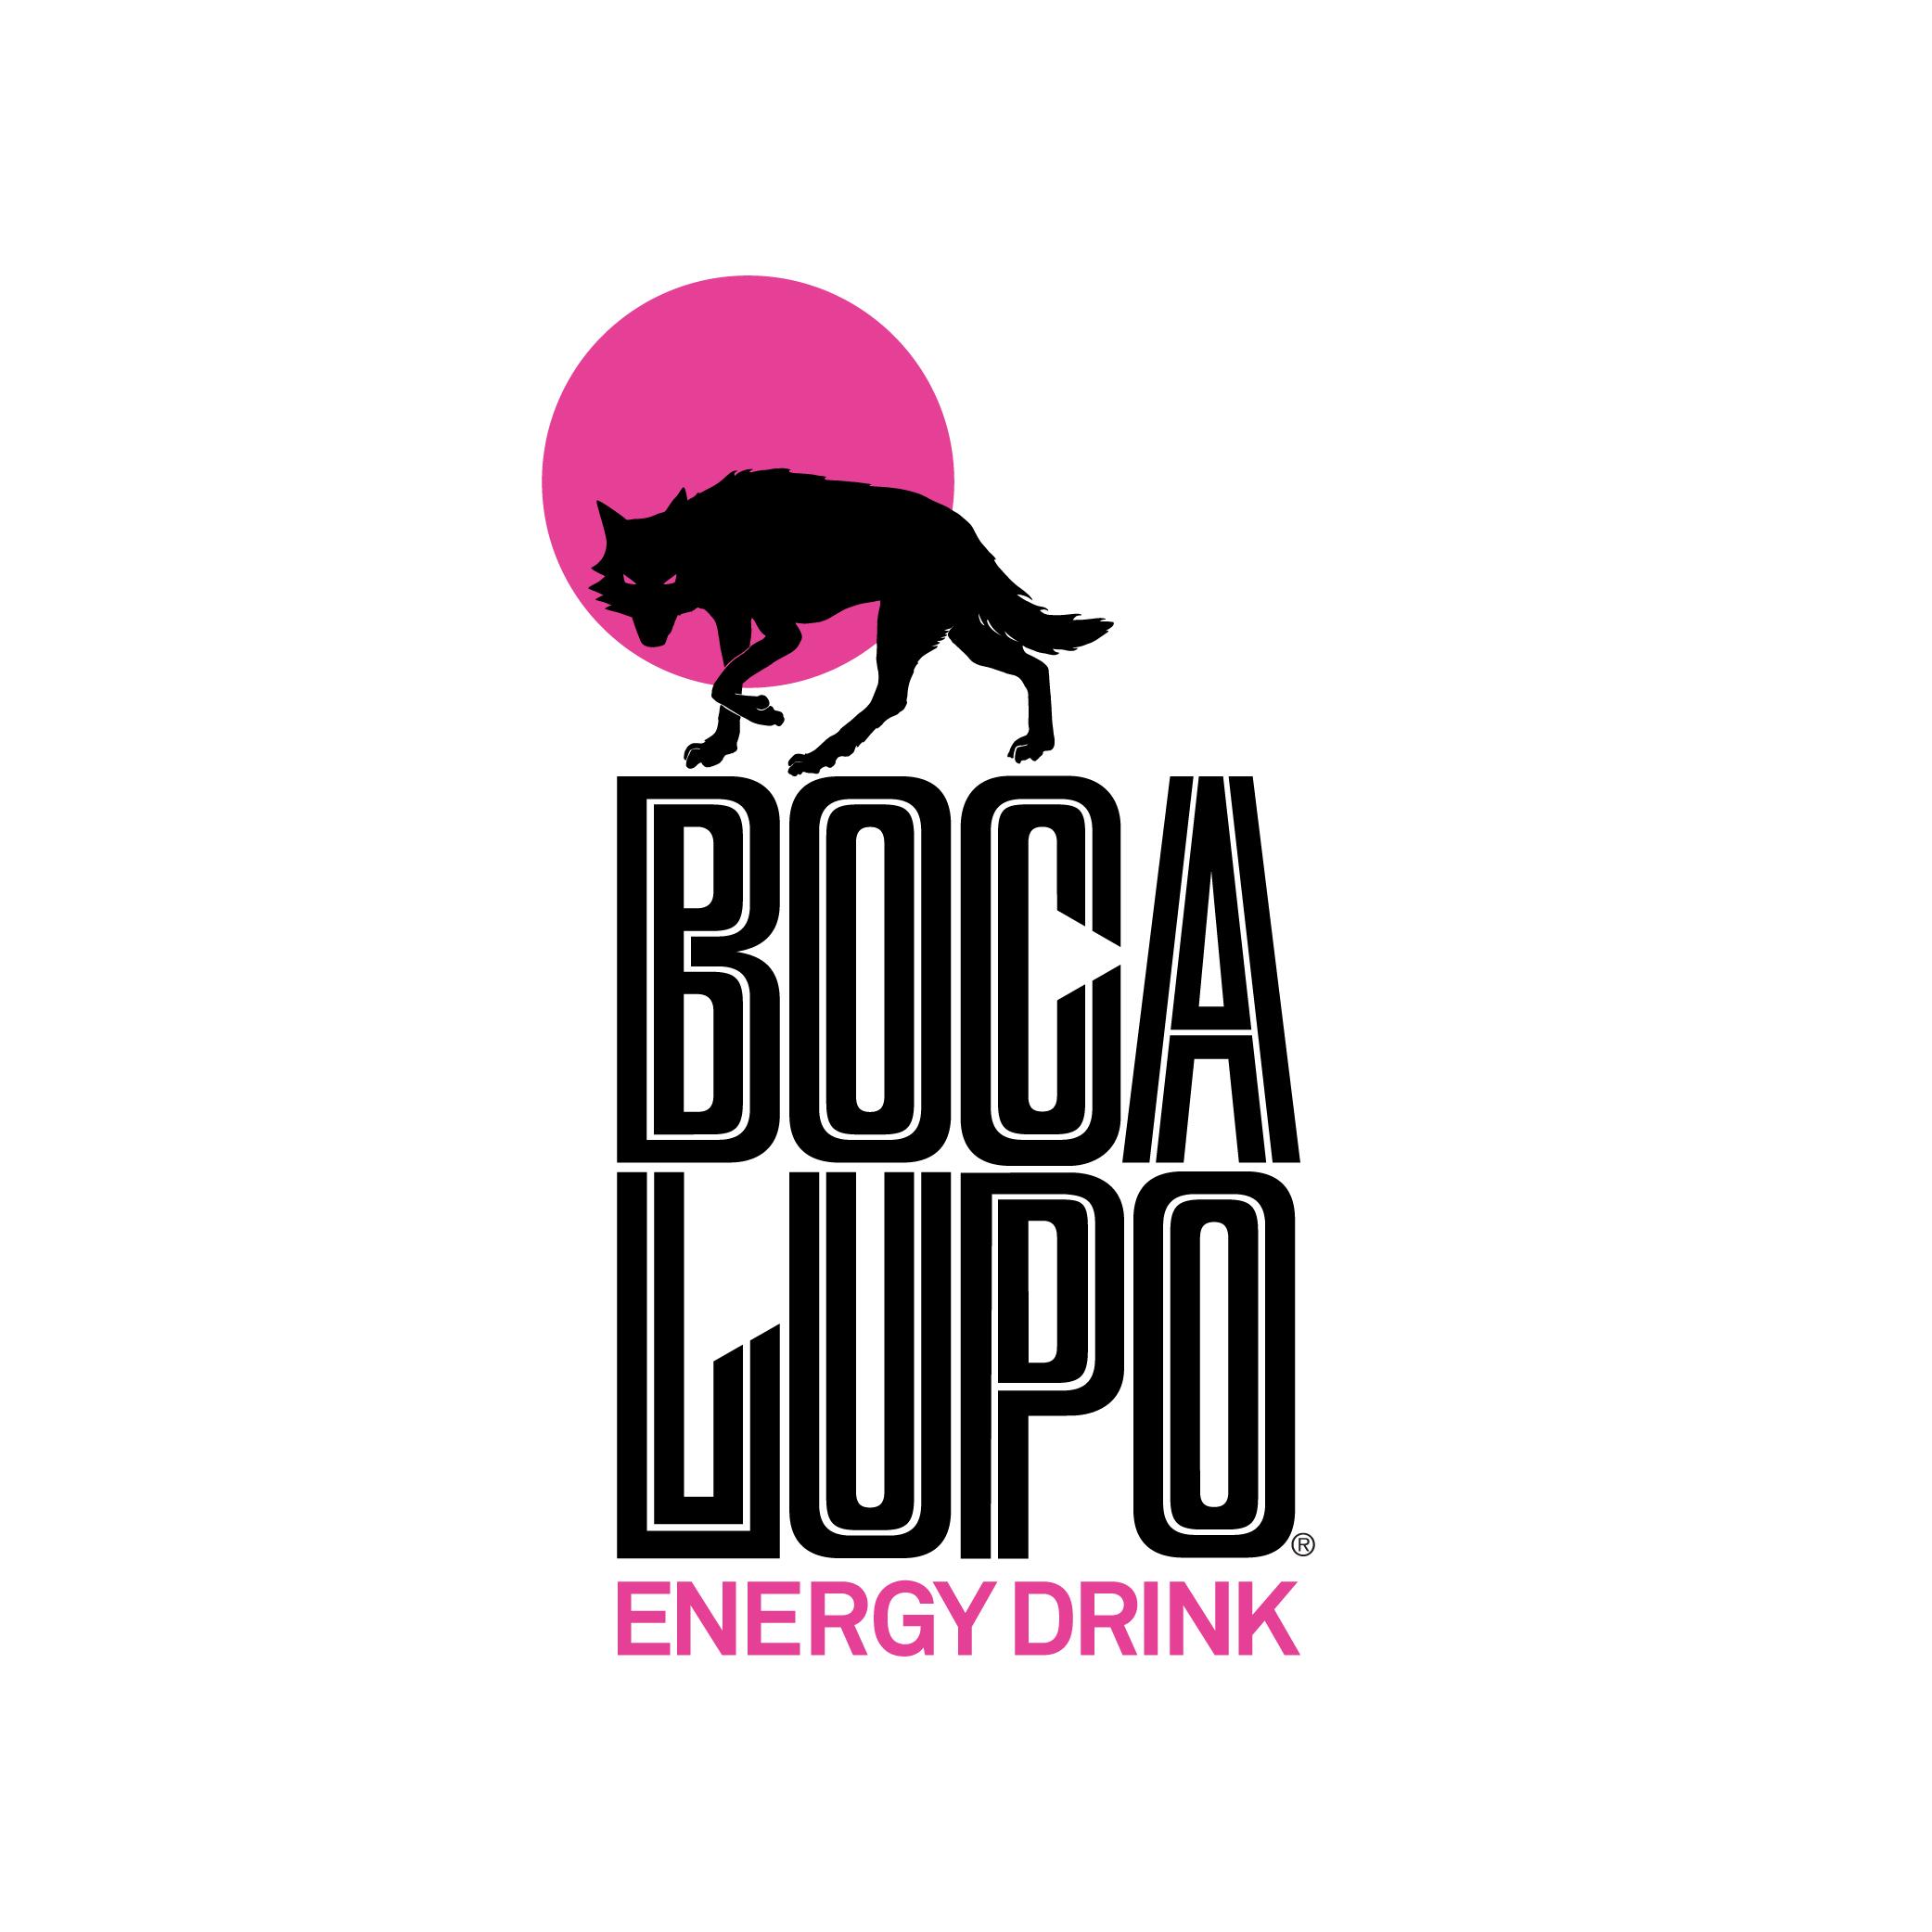 BOCA LUPO